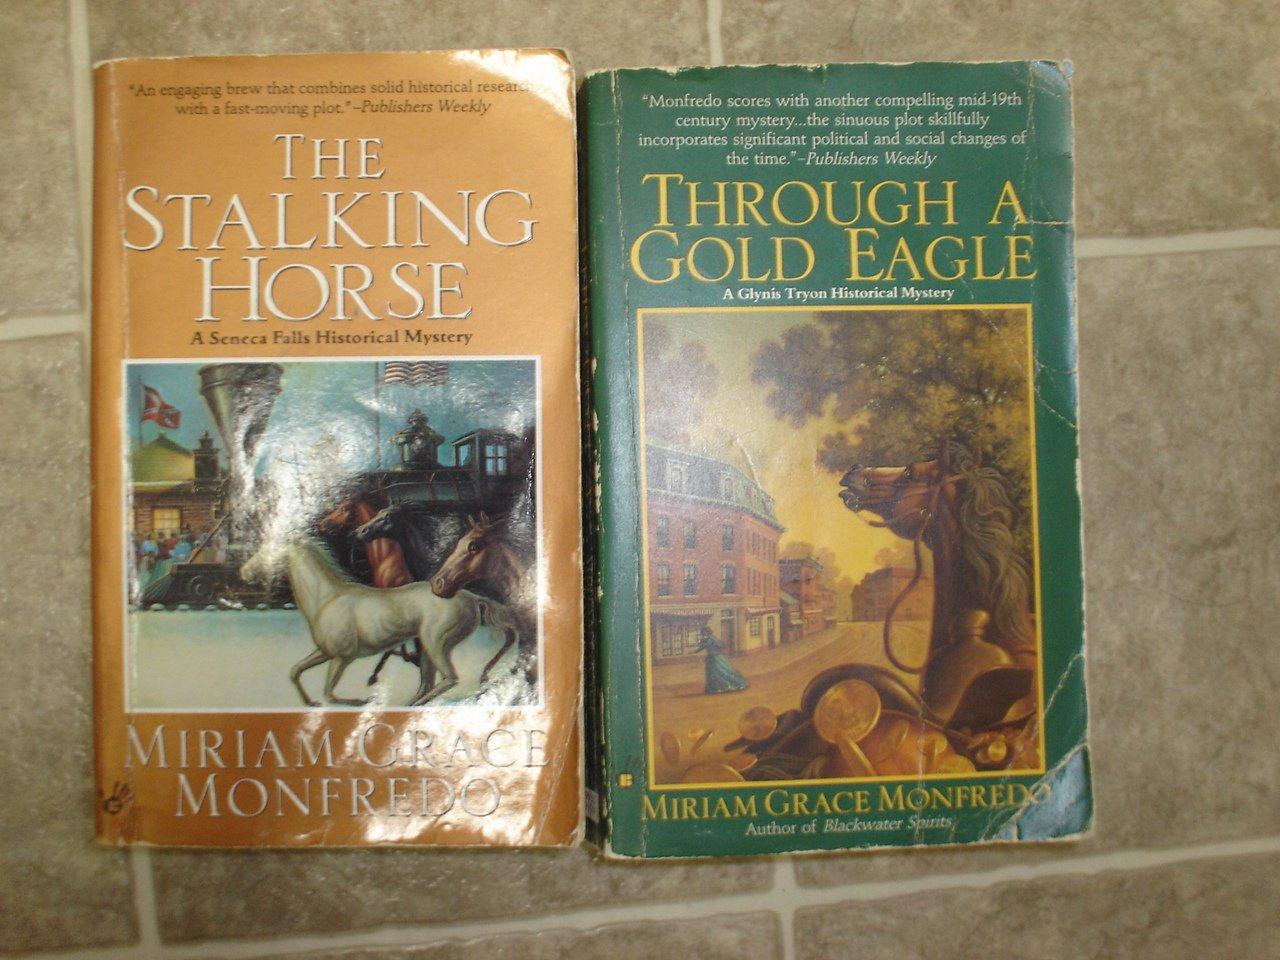 Miriam Grace Monfredo lot of 3 pb mystery books Seneca Falls Historical Berkley Prime Crime